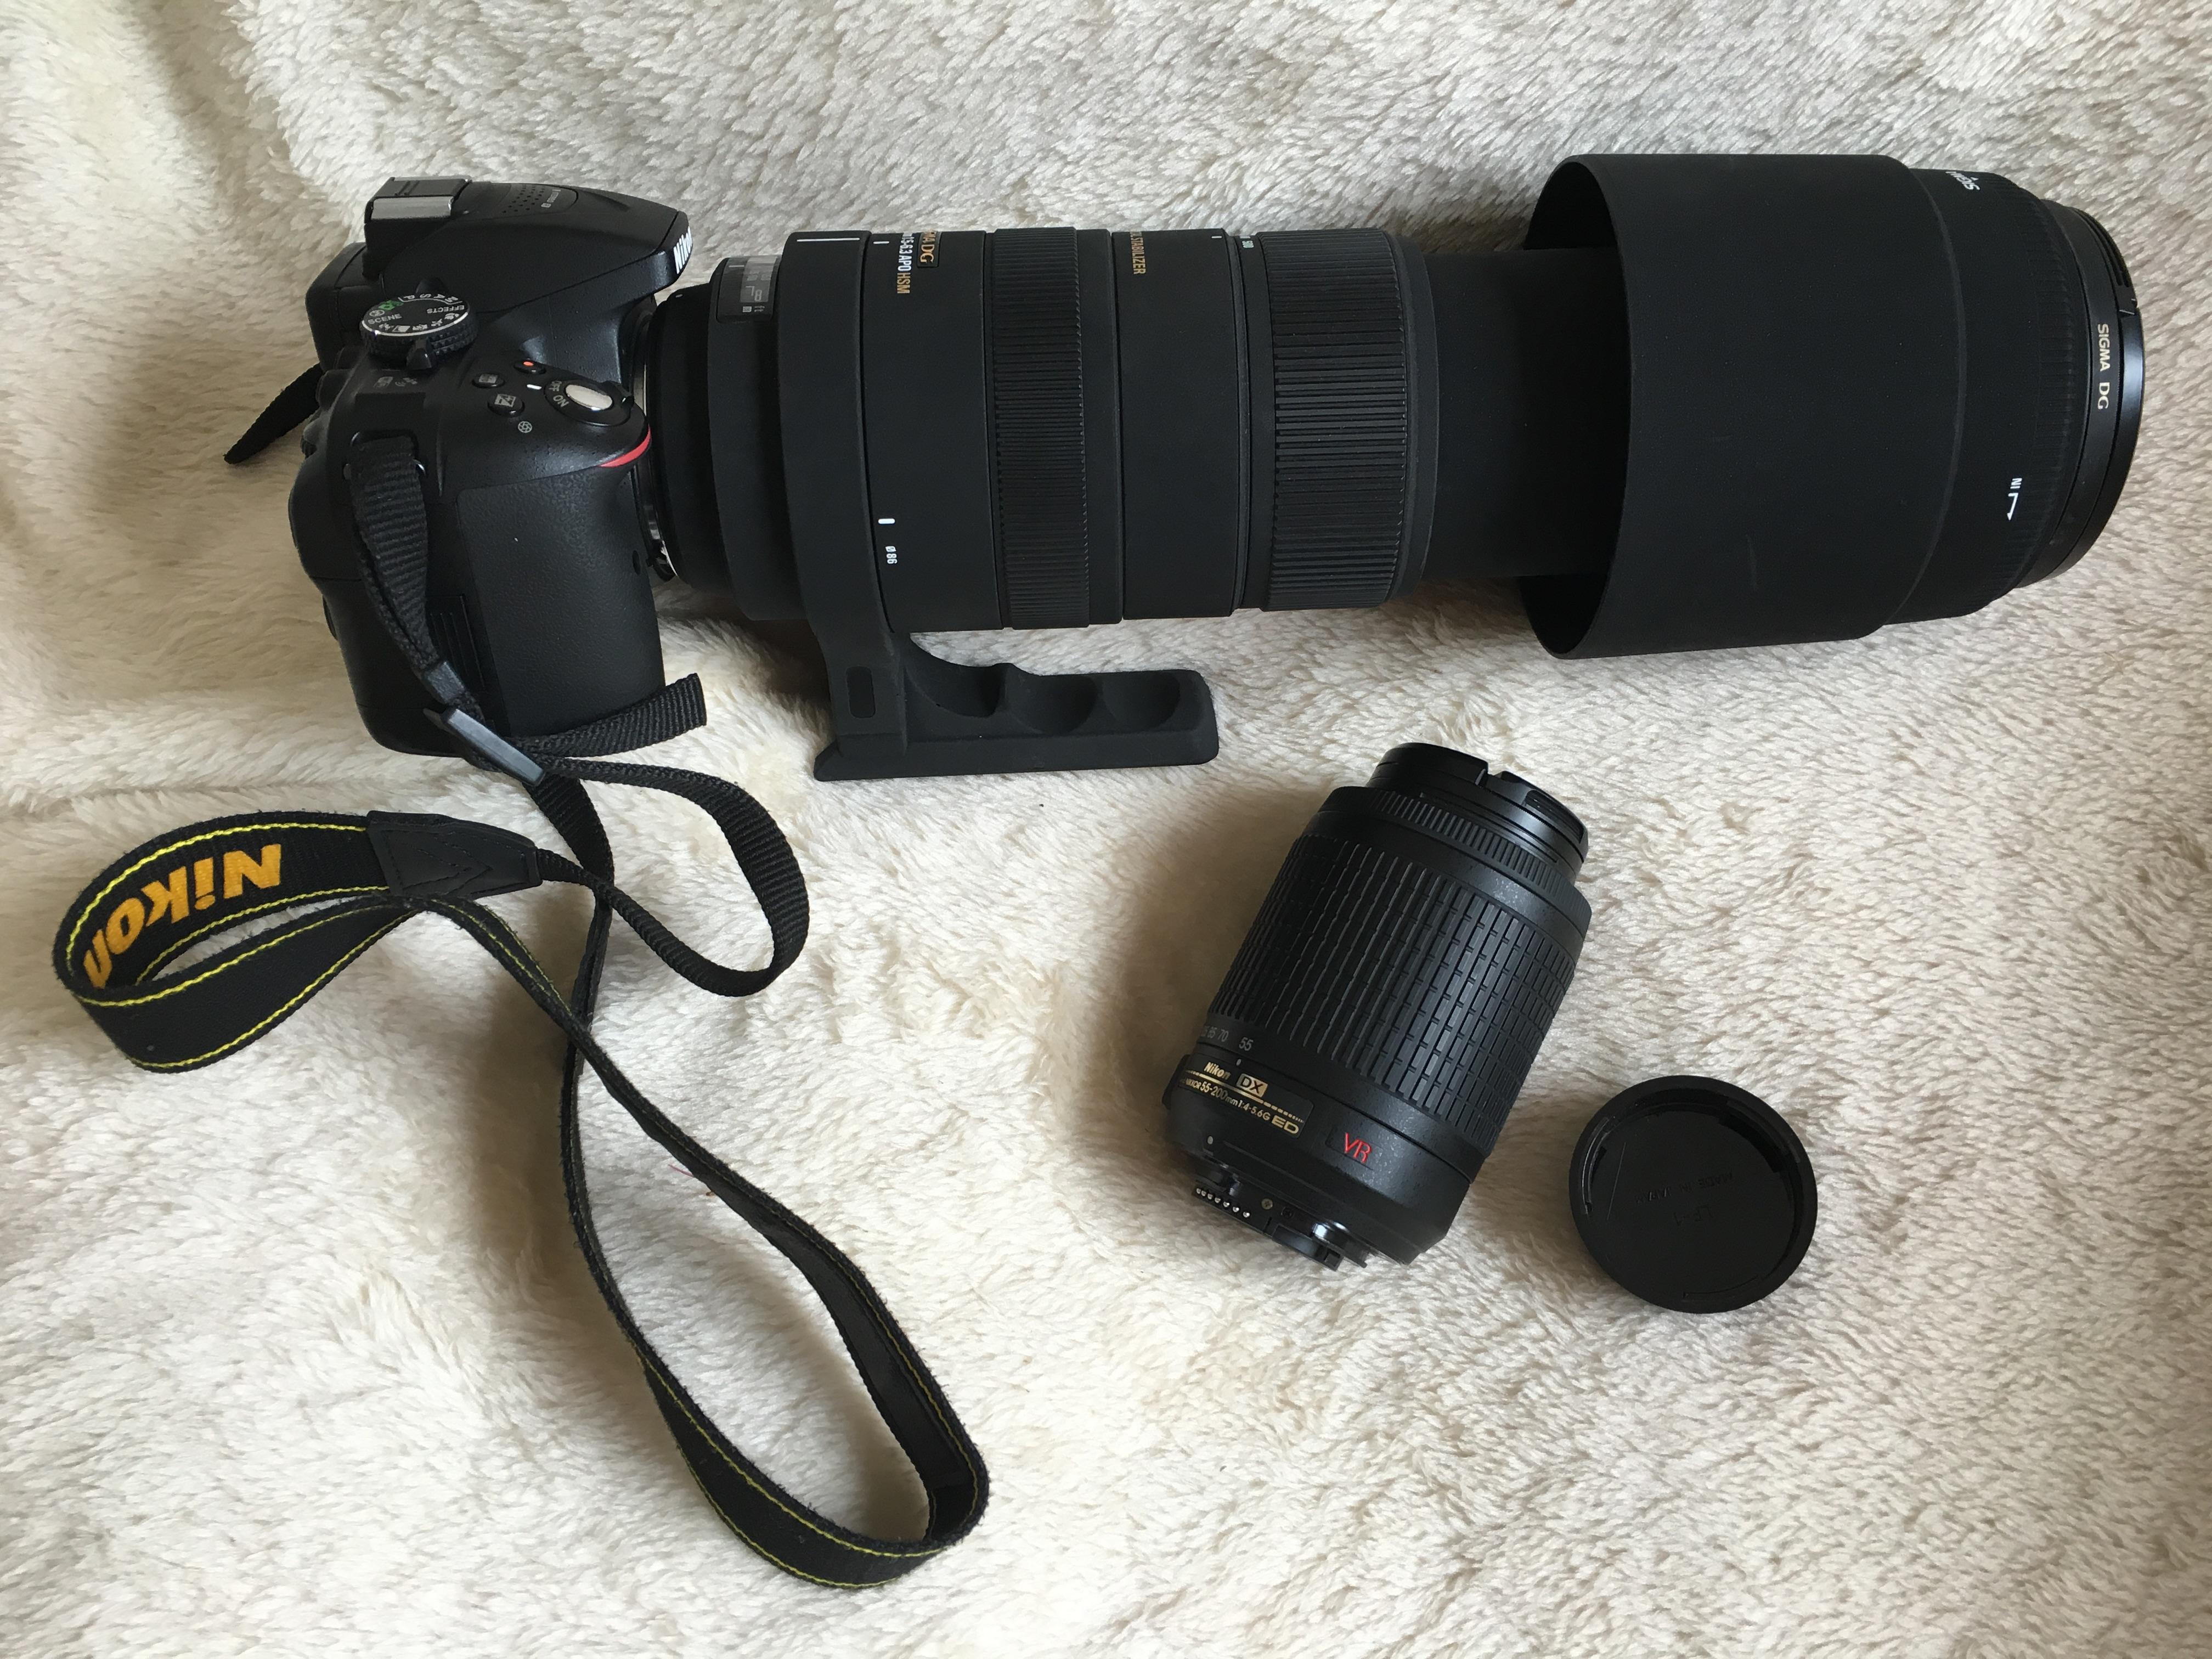 A 200mm Kit Lens vs A Sigma 150mm-500mm lens